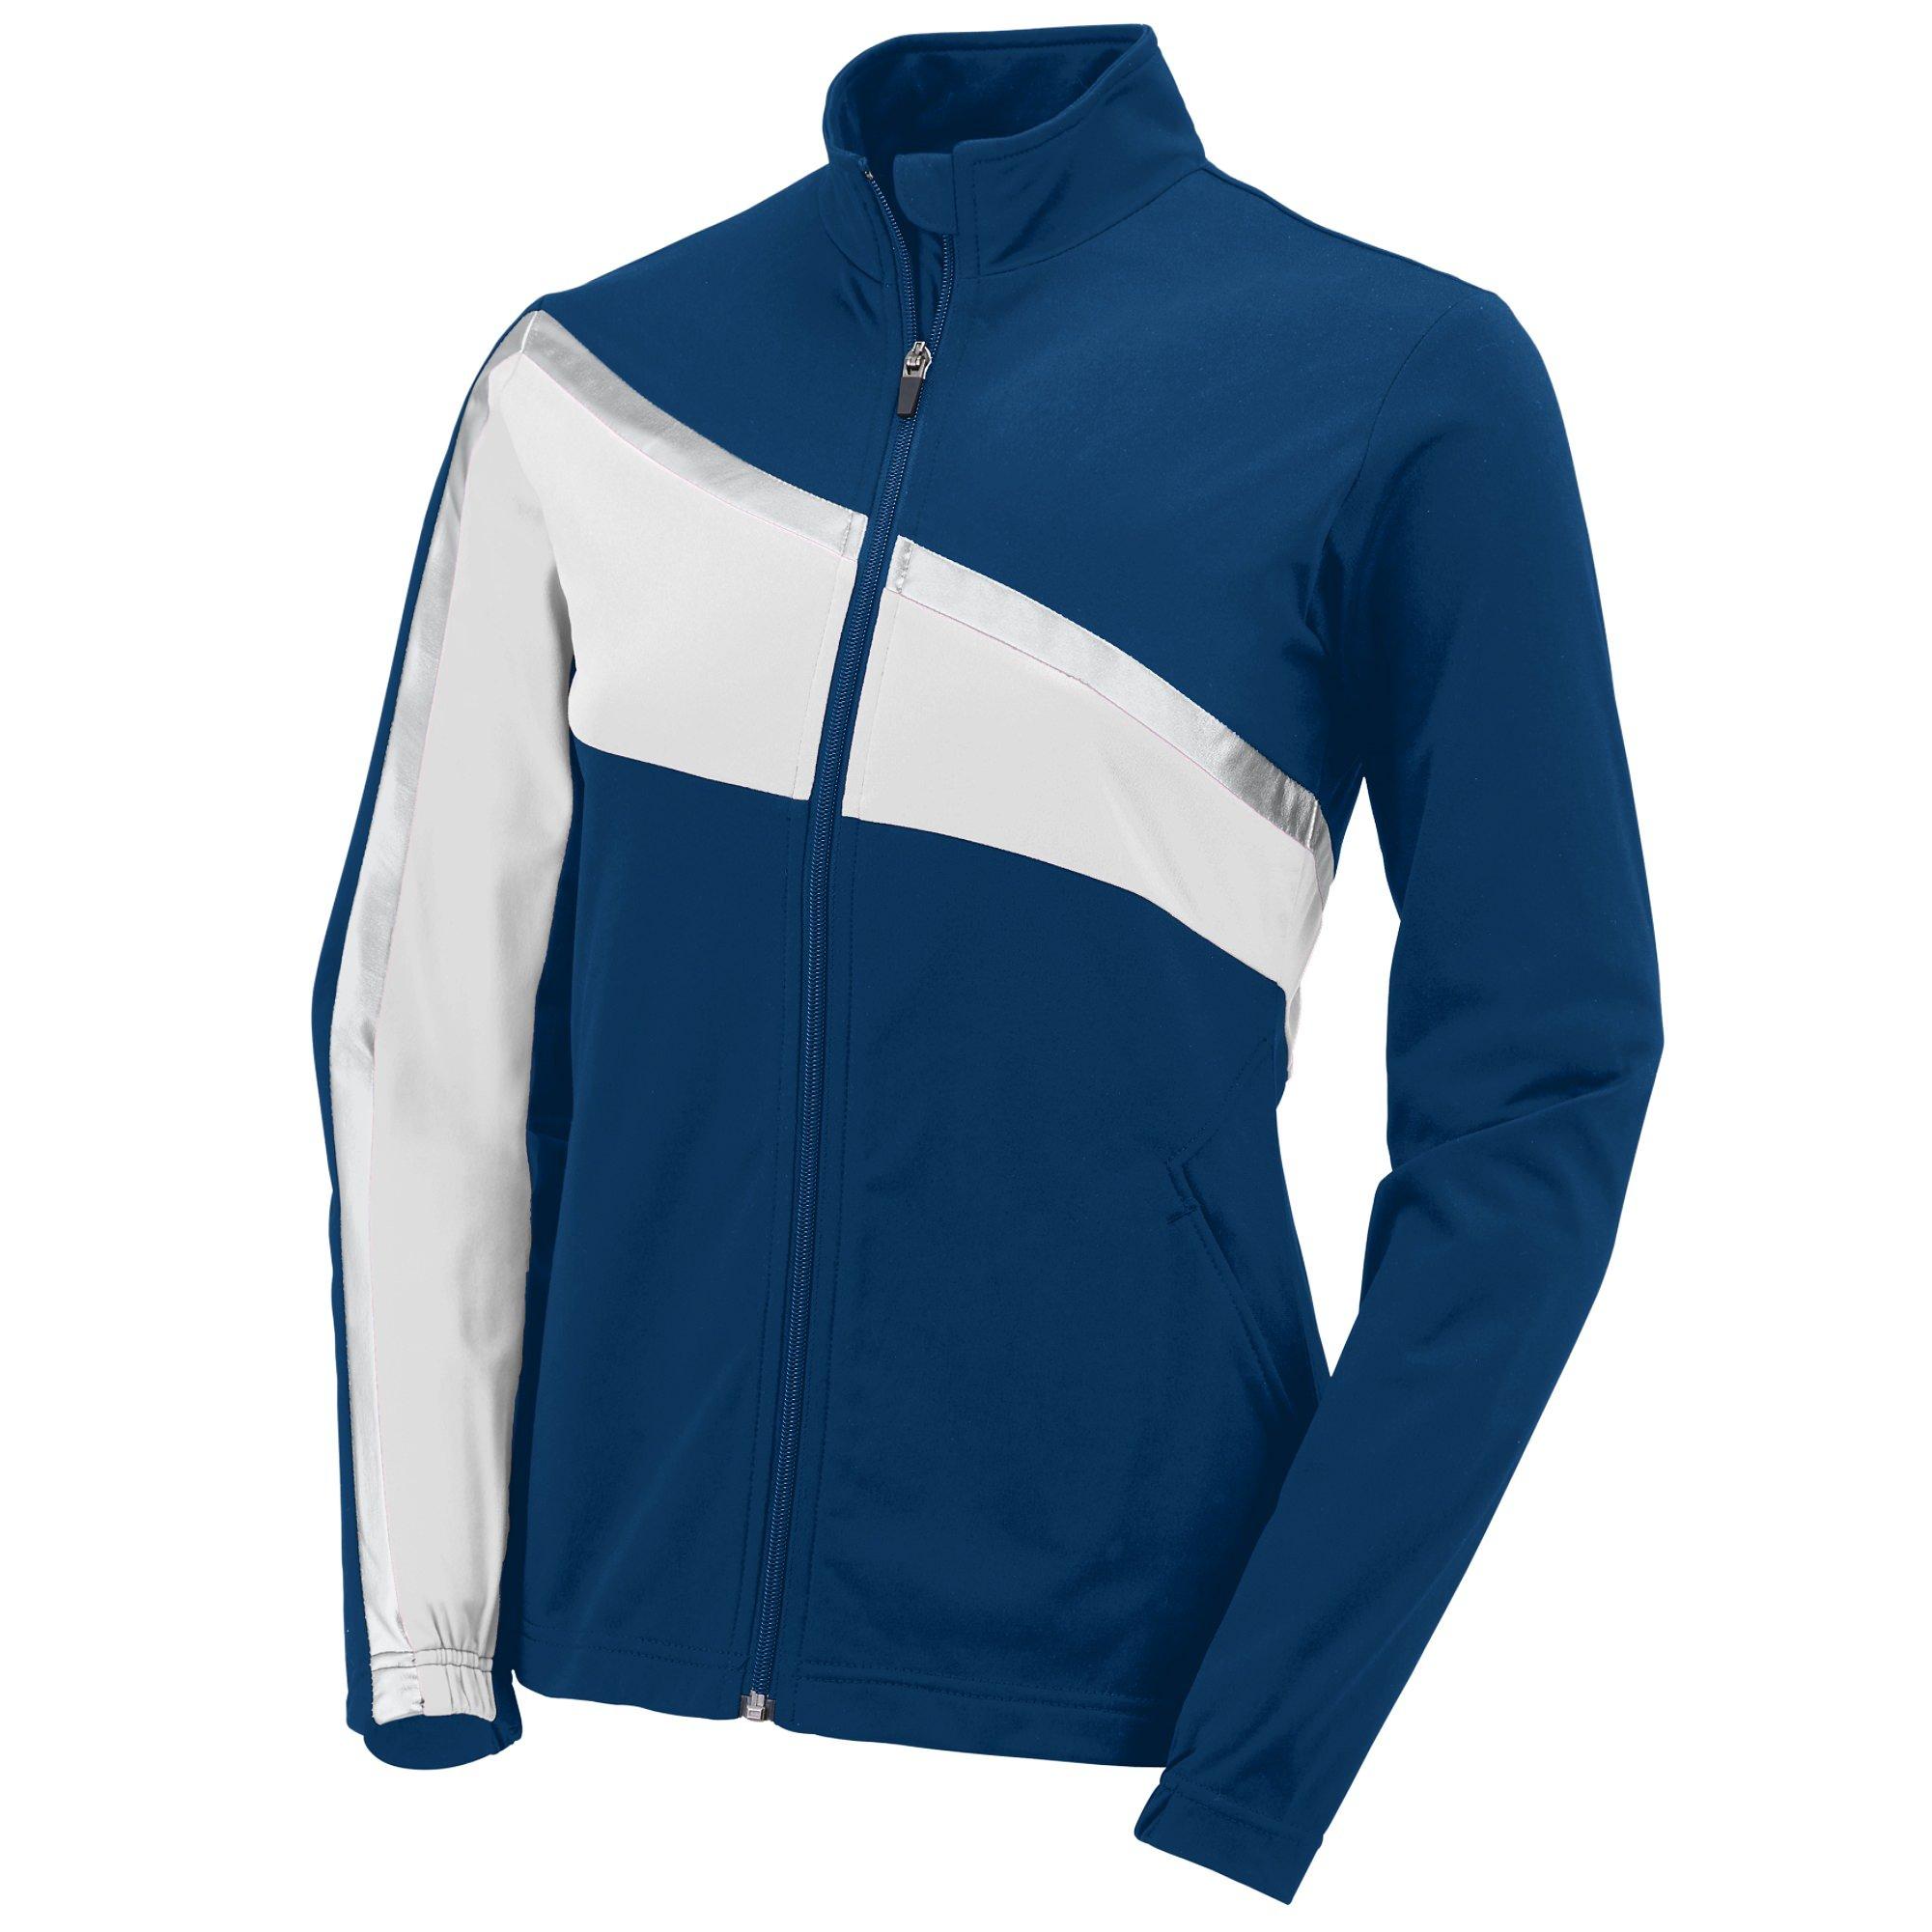 Augusta Sportswear Womens Aurora Jacket, Navy/White/Metallic Silver, XX-Large